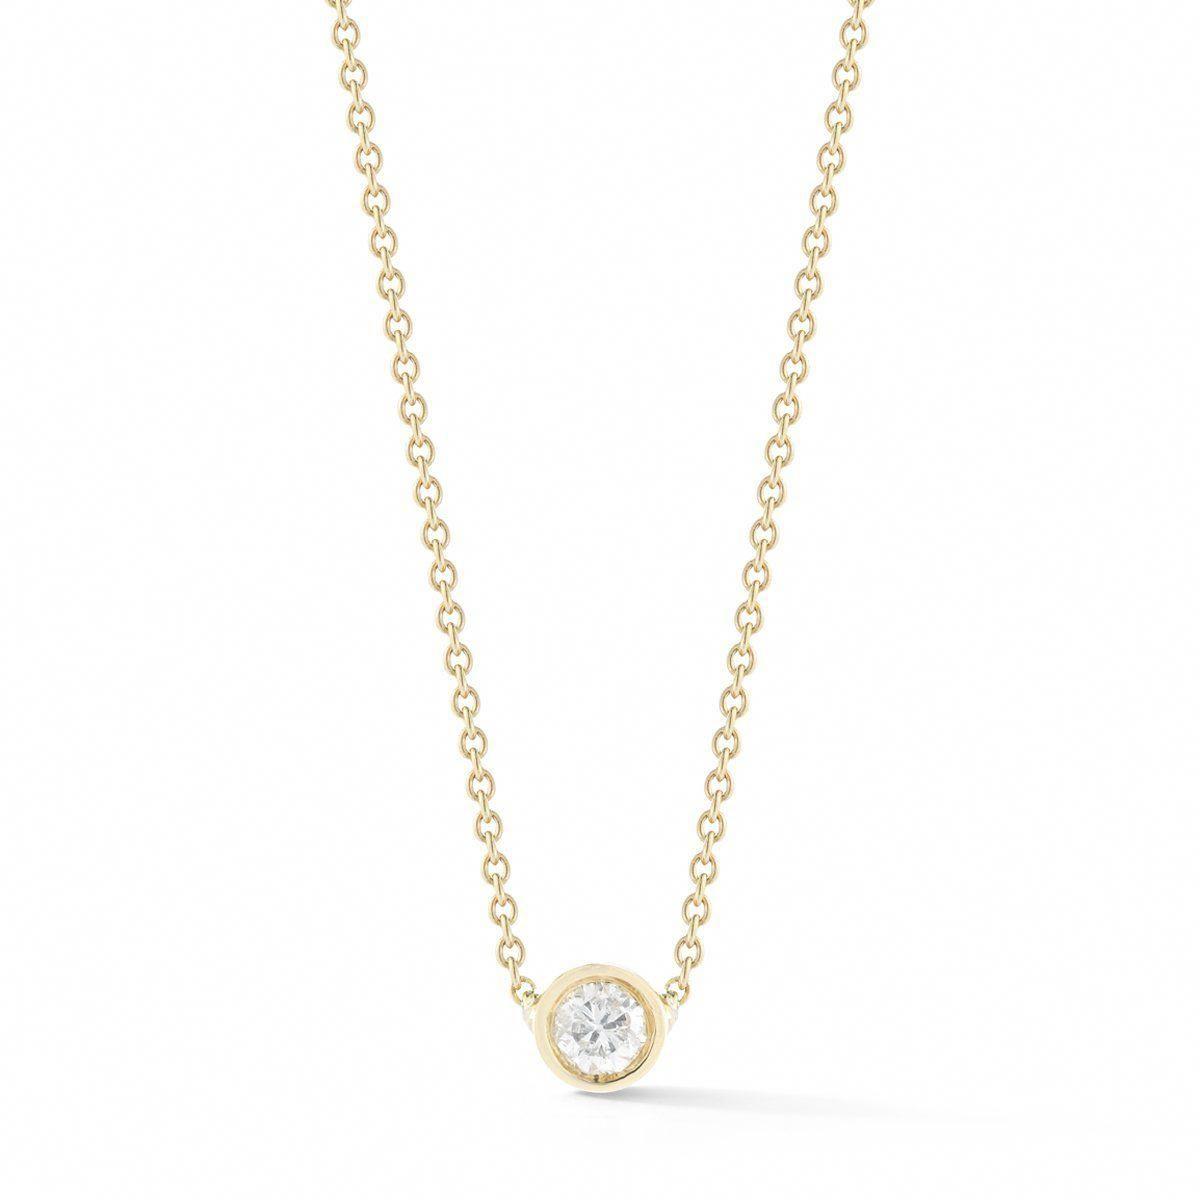 68a482903f4b0e Small Round Diamond Necklace - STONE AND STRAND #diamondnecklaces Initial  Pendant Necklace, Stone Necklace